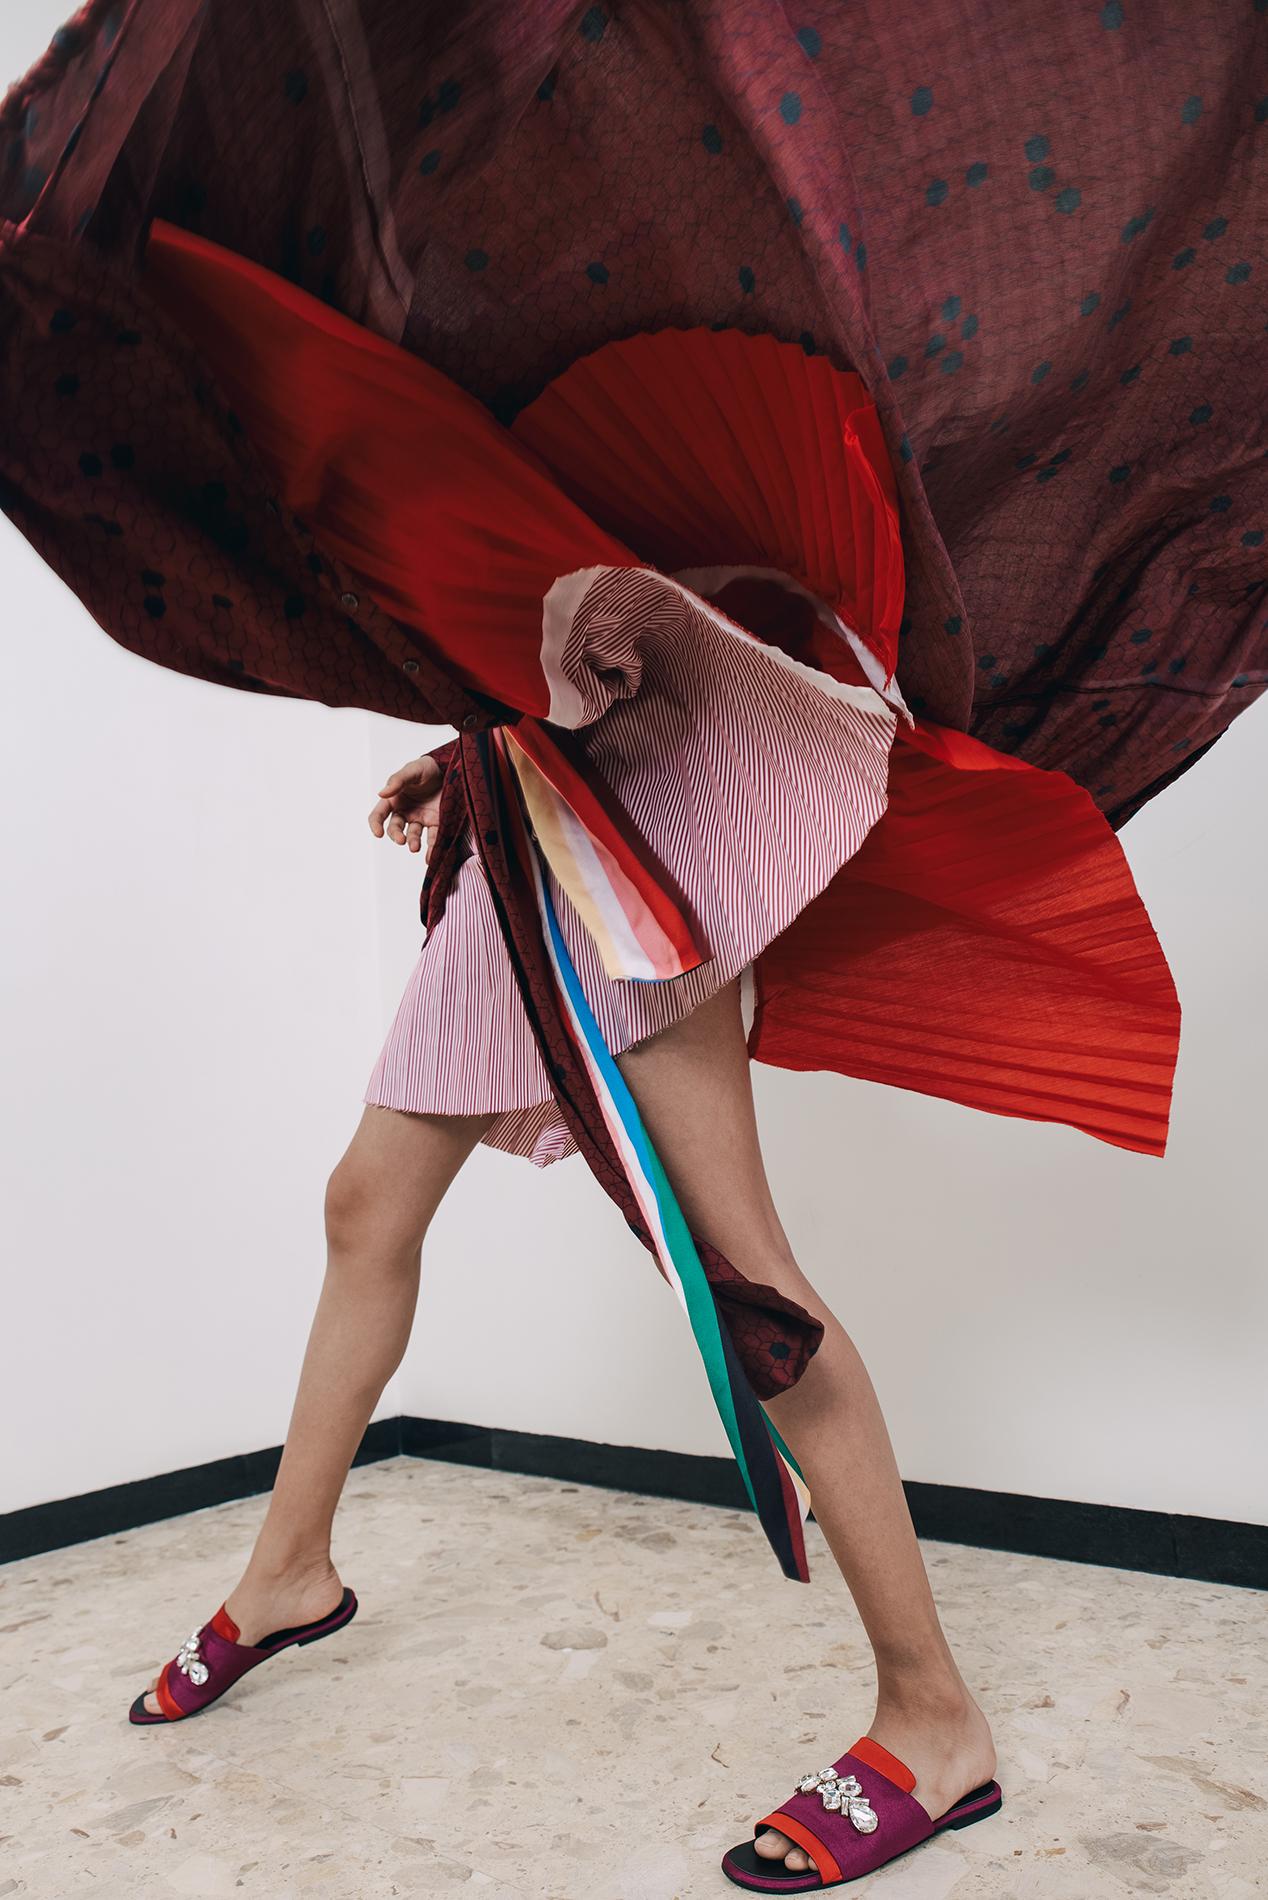 Top – HERA BY AJ Dress – CHOLA Skirt – MADISON Earring – LARA MORAKHIA Footwear – THE HEEL HUSTLE